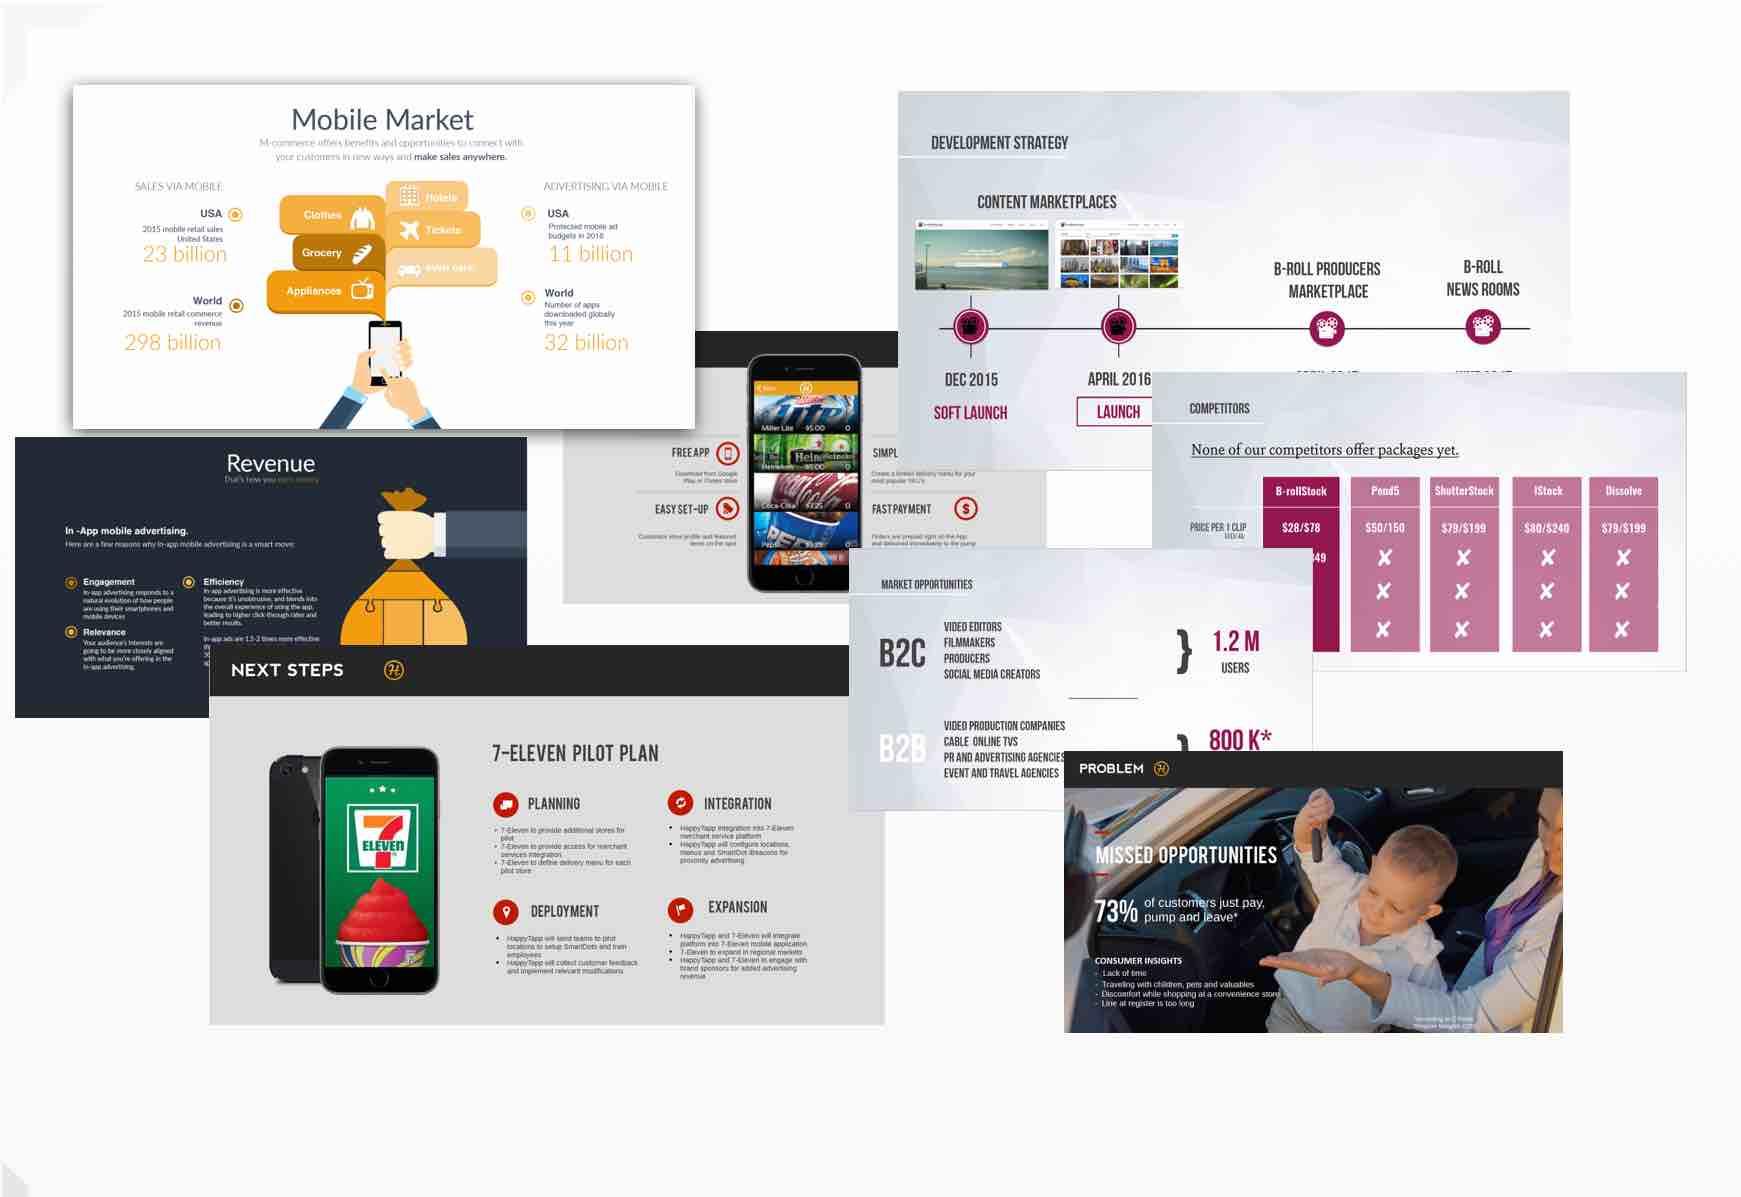 pitch+deck+startup+Los+angeles+presentation+funds+round+investors.jpg